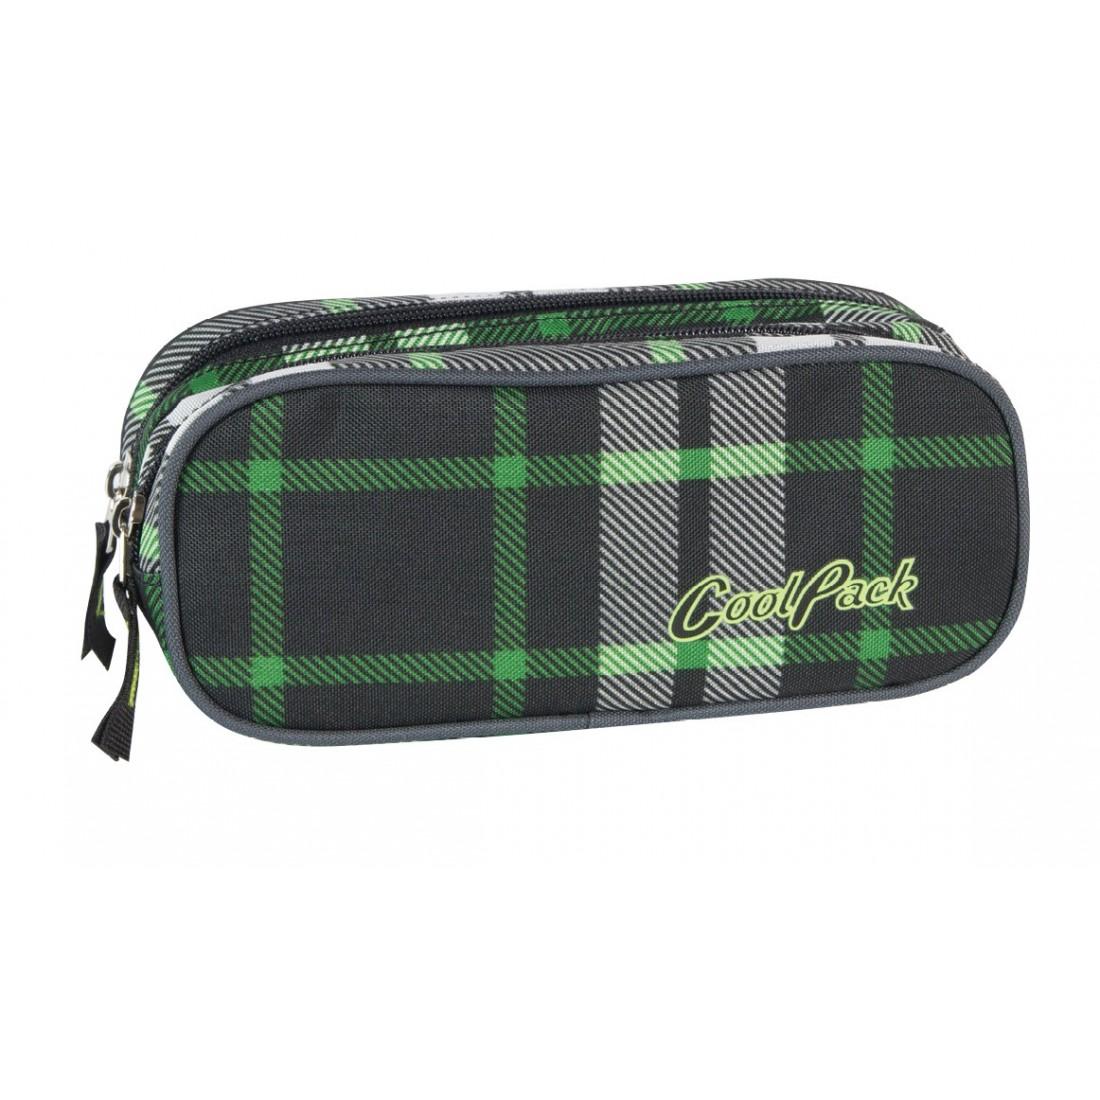 Saszetka podwójna CoolPack CLEVER GREEN TARTAN CP 184 - plecak-tornister.pl